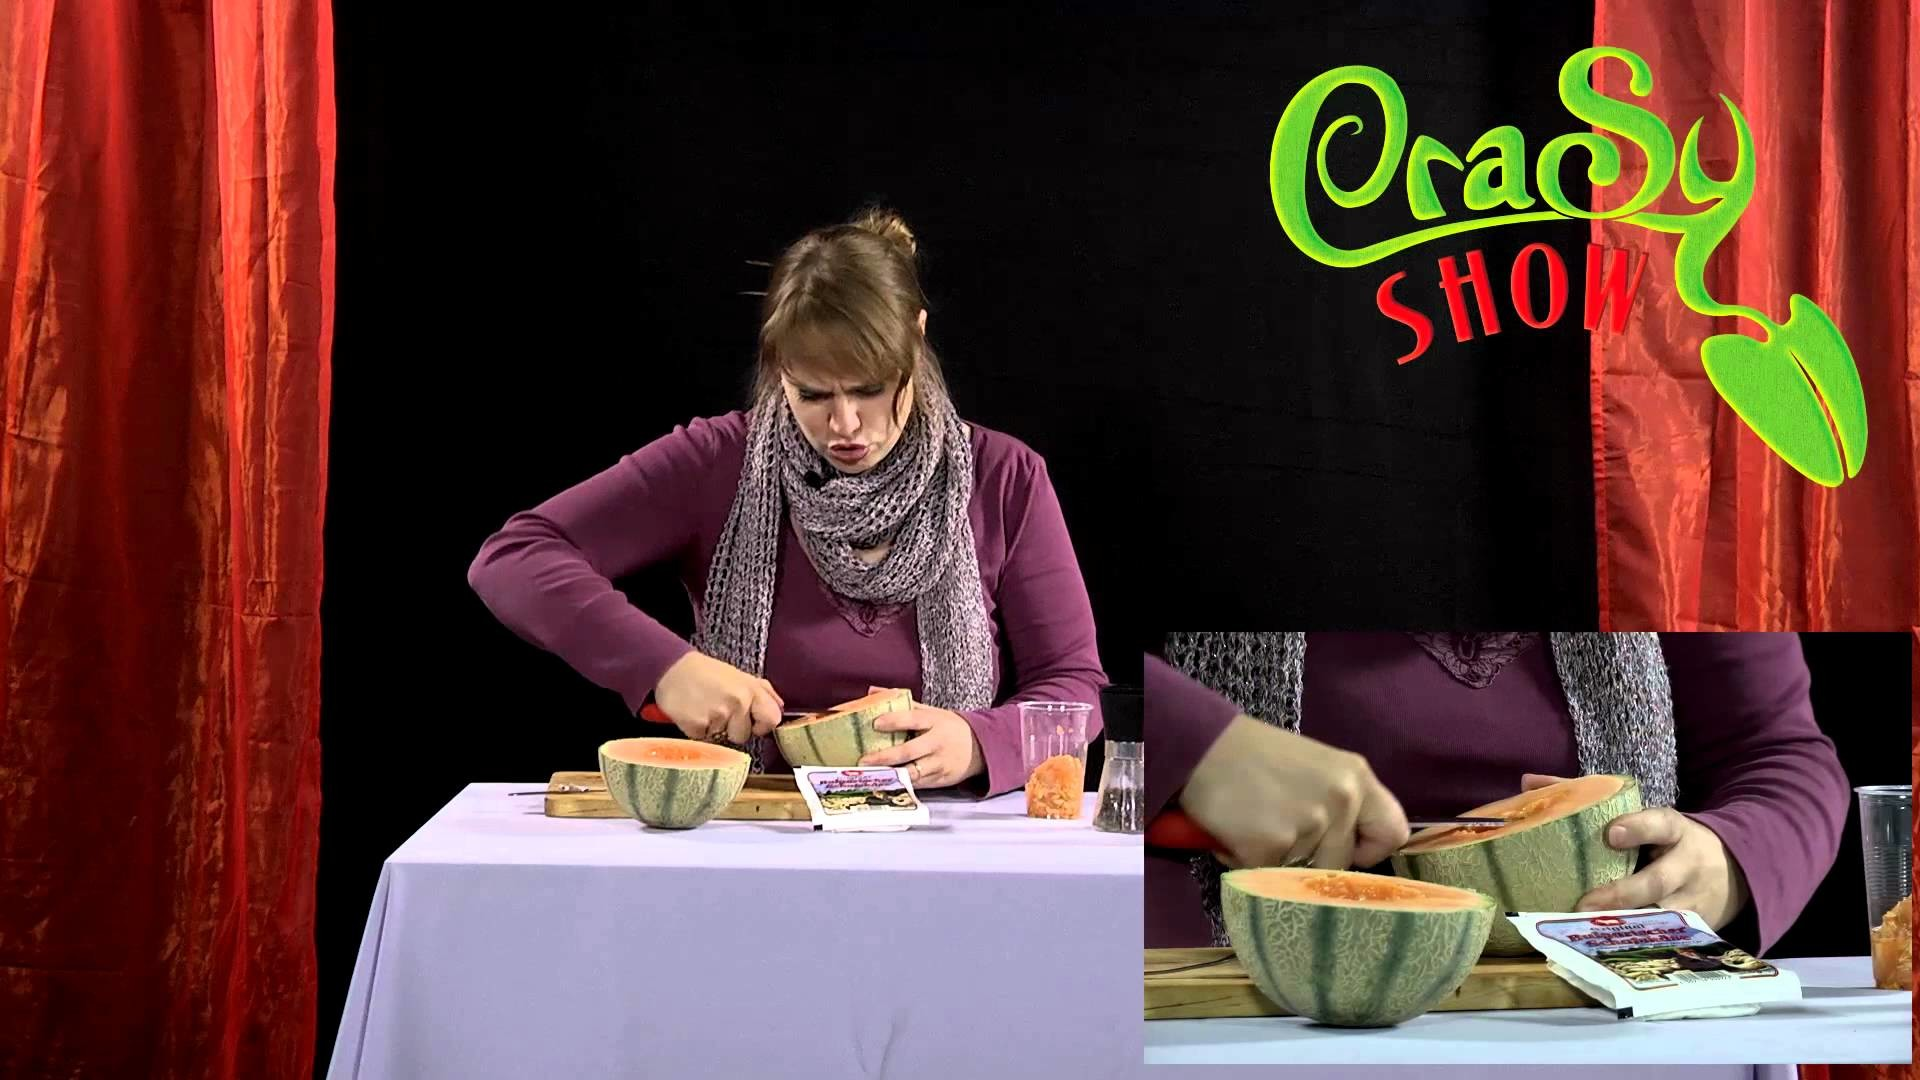 HÄKELSCHRIFTEN richtig lesen! (CraSy Basics) & Melonensalat (CraSy Cooking)